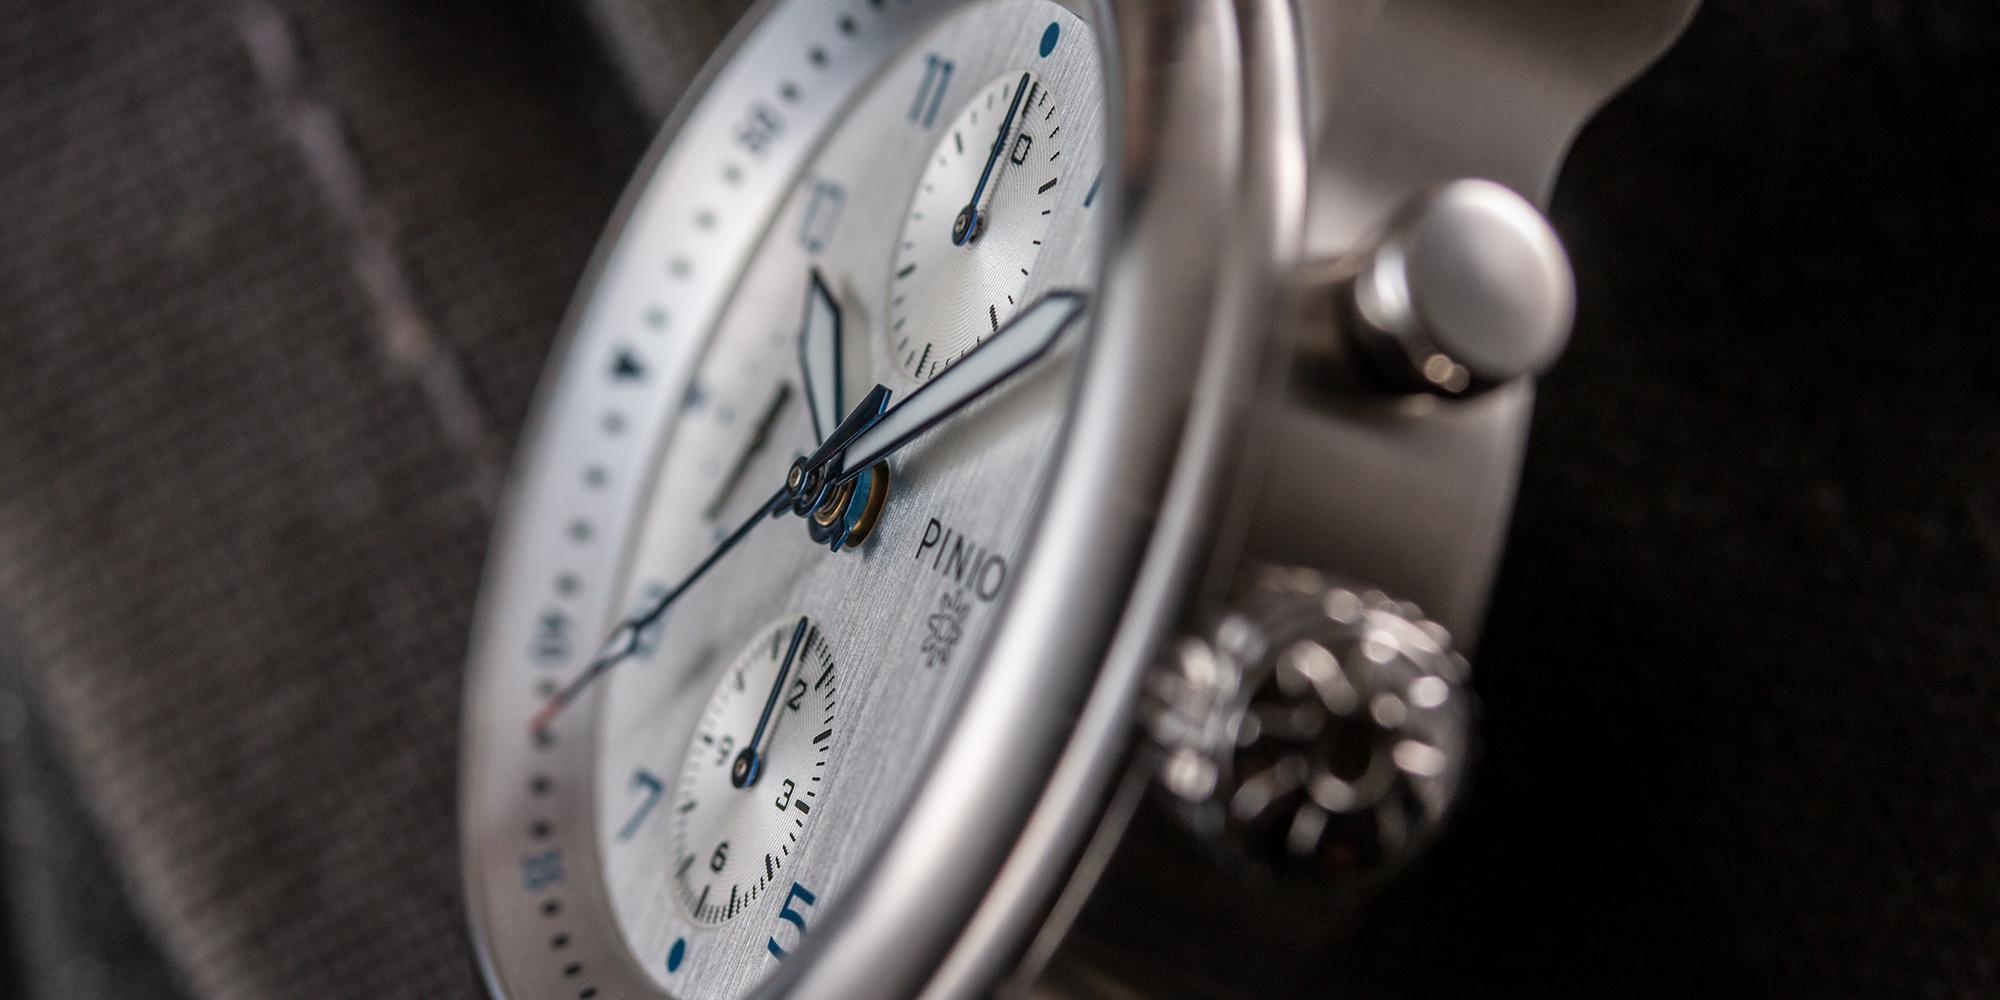 pinion-elapse-chronograph-silver-dial-004